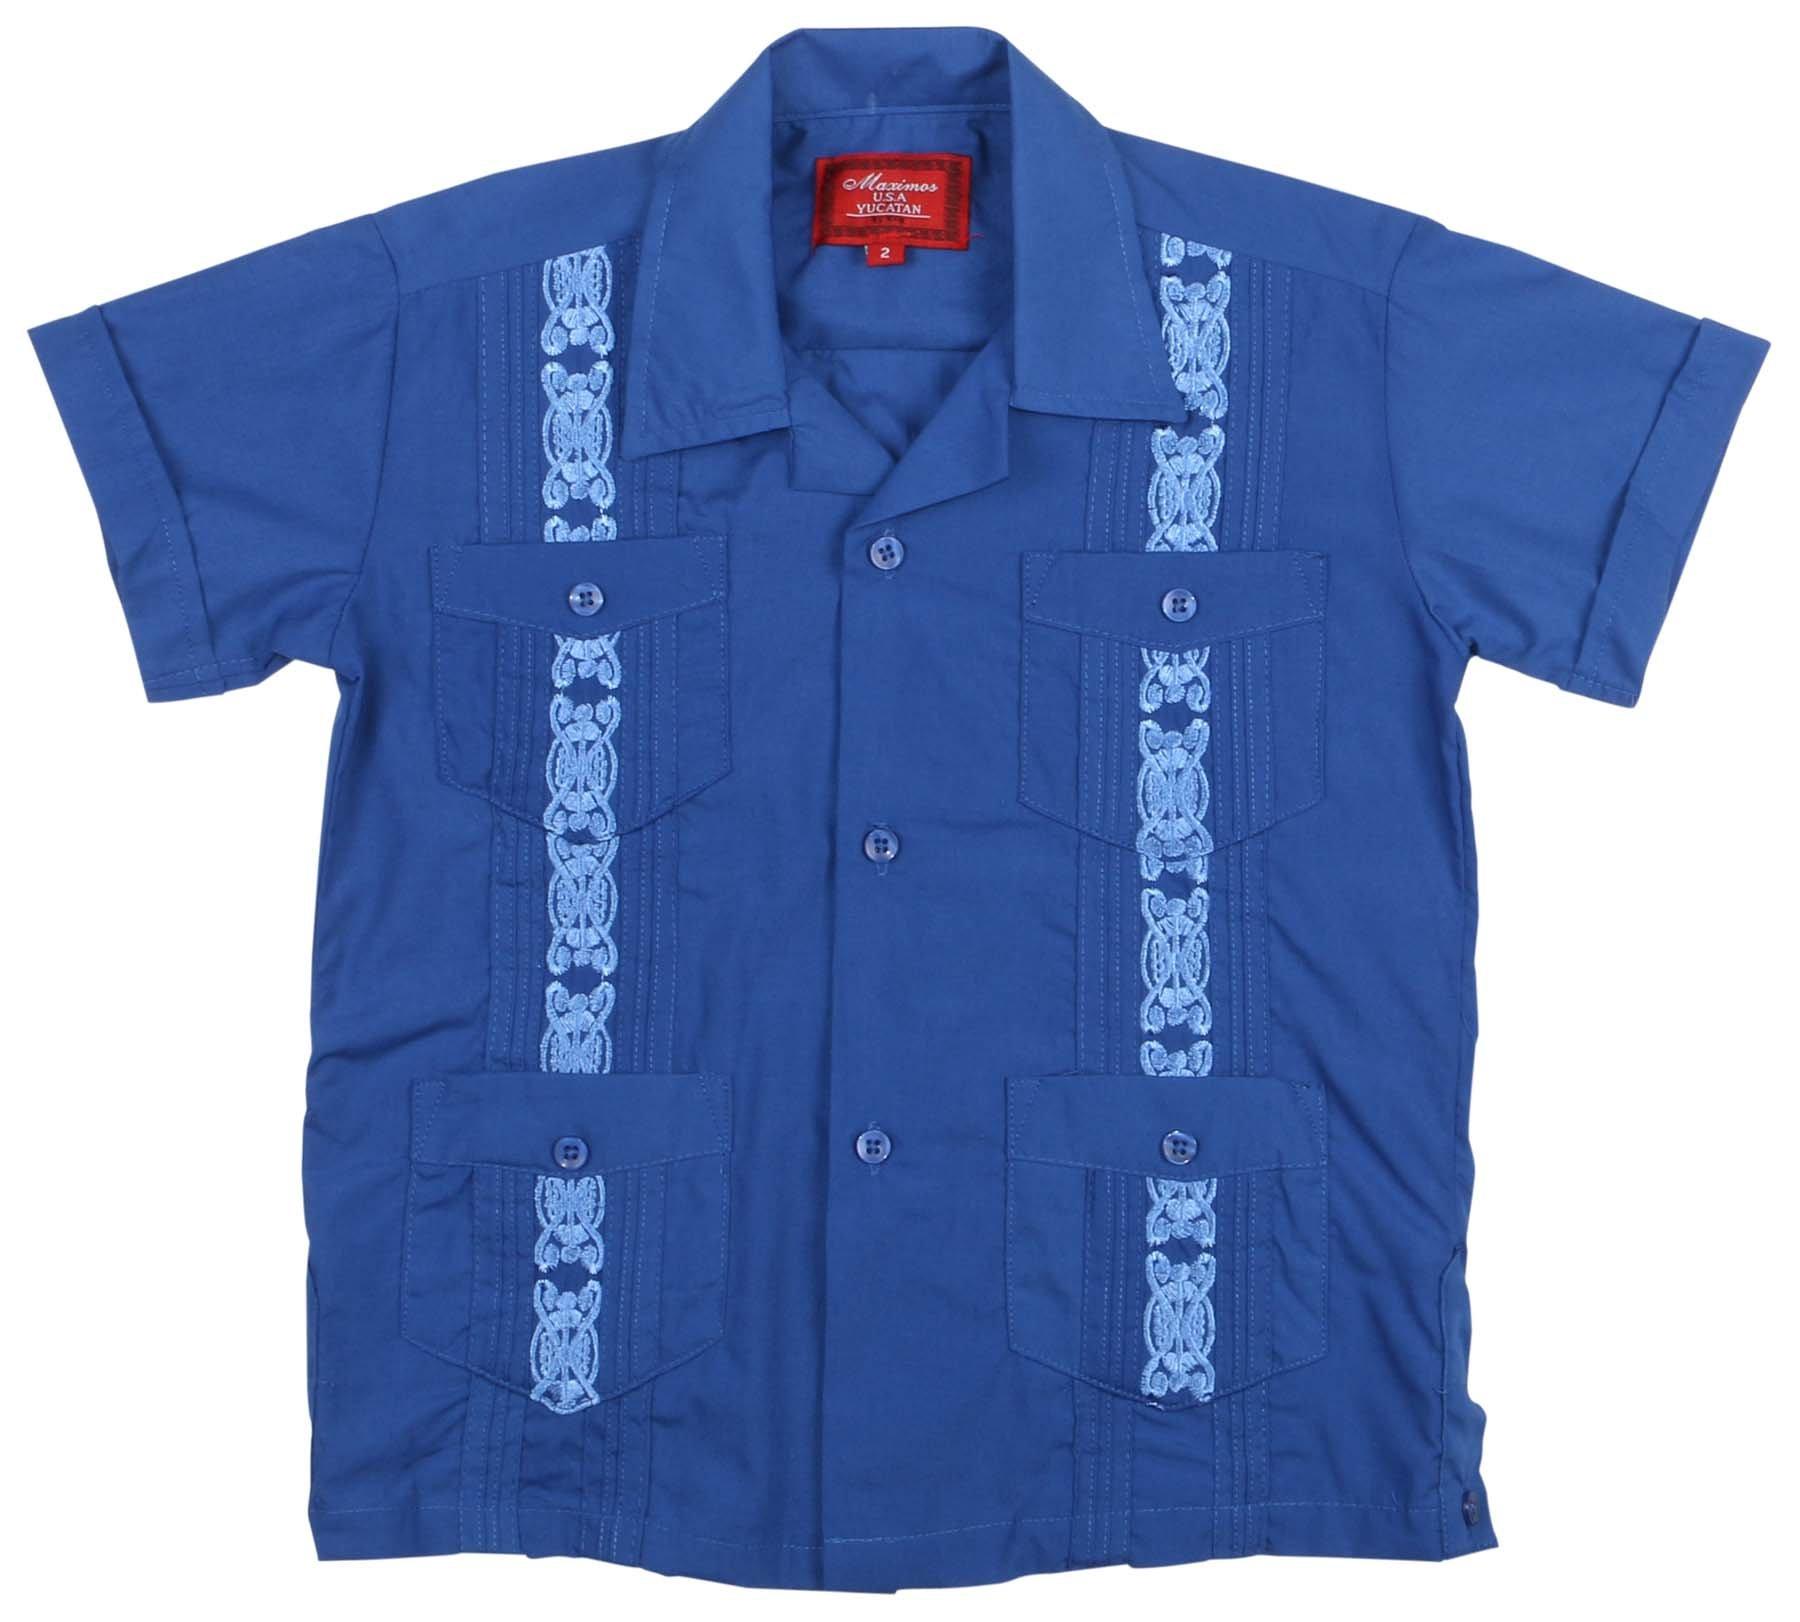 9 Crowns Essentials Boys' Guayabera Button Down Shirt-Royal Blue-10